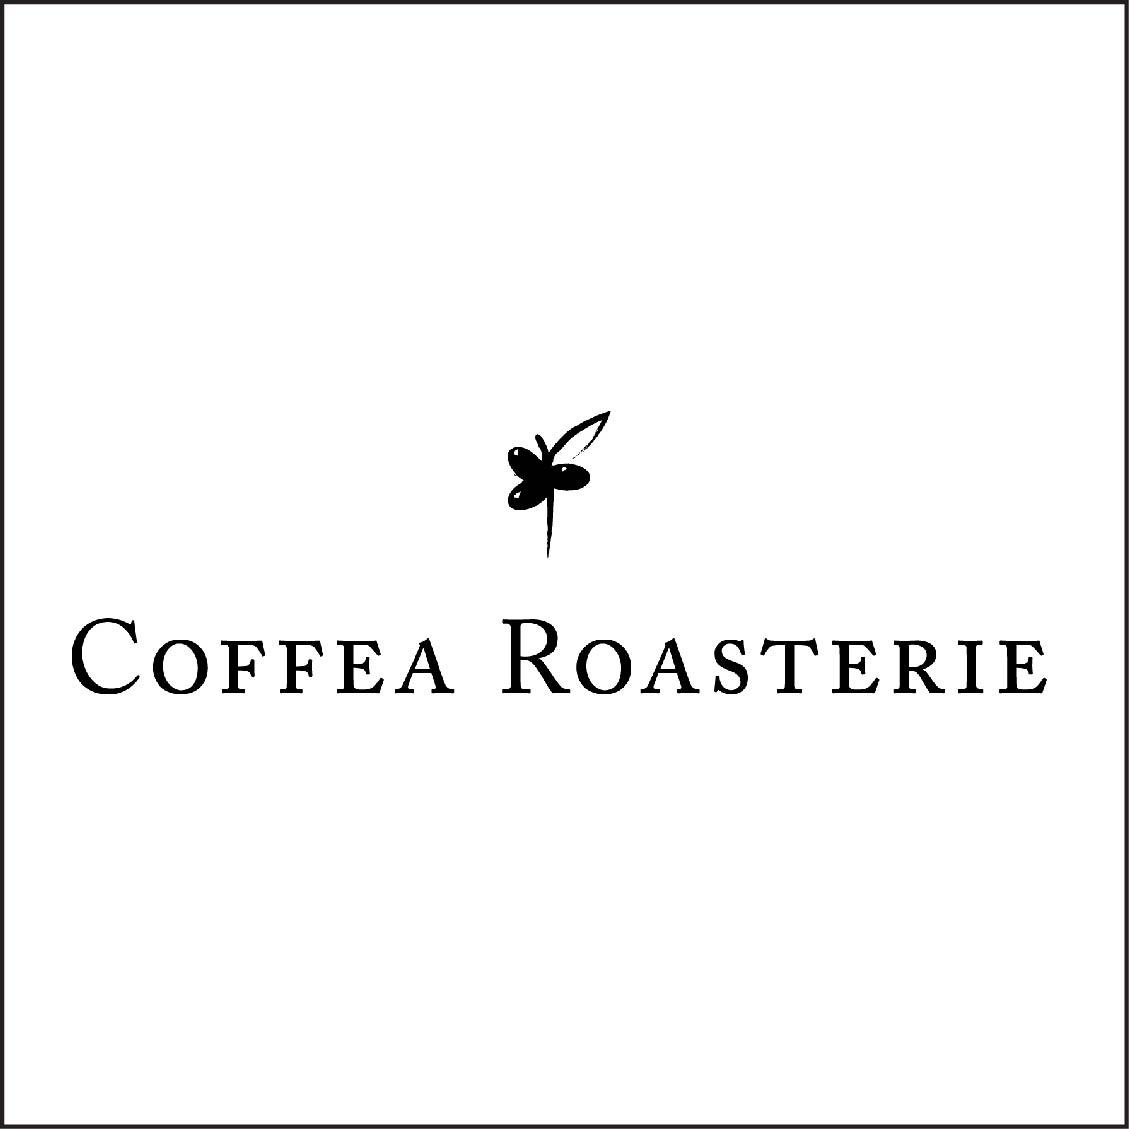 Coffea.jpg